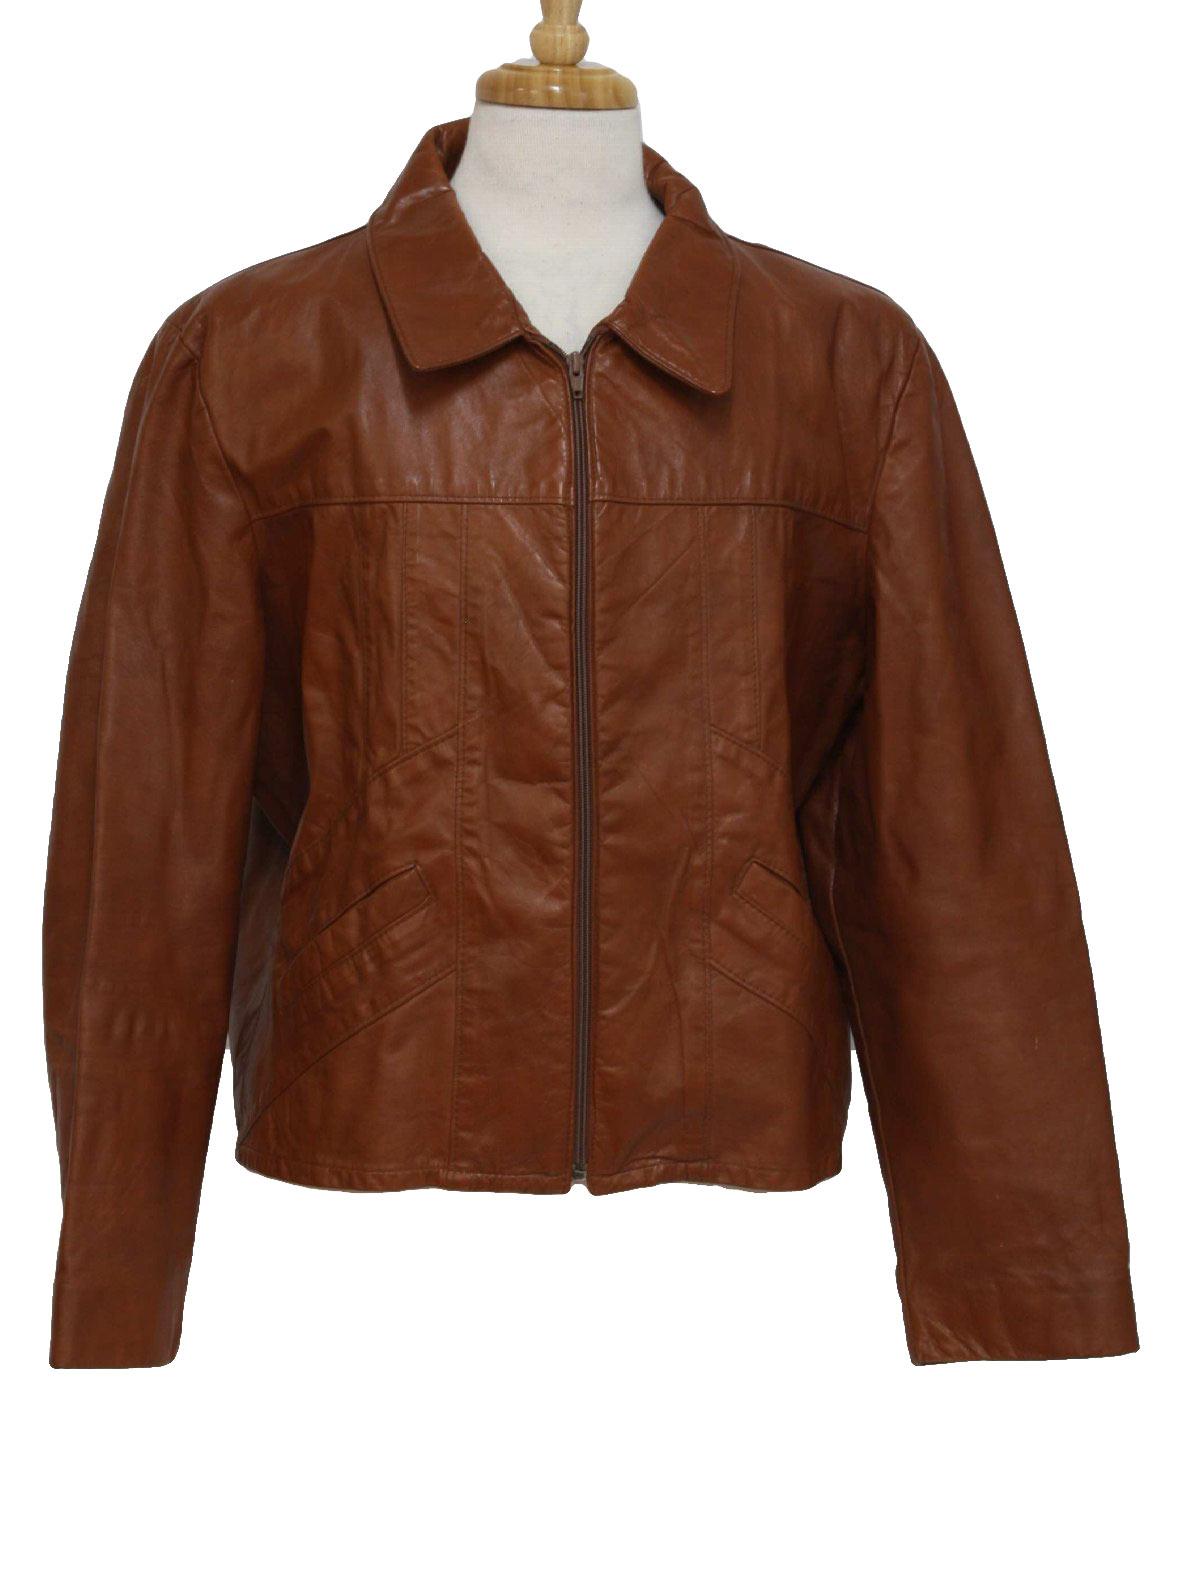 Vintage 1970's Leather Jacket: 70s -Care Label- Mens brick brown zip